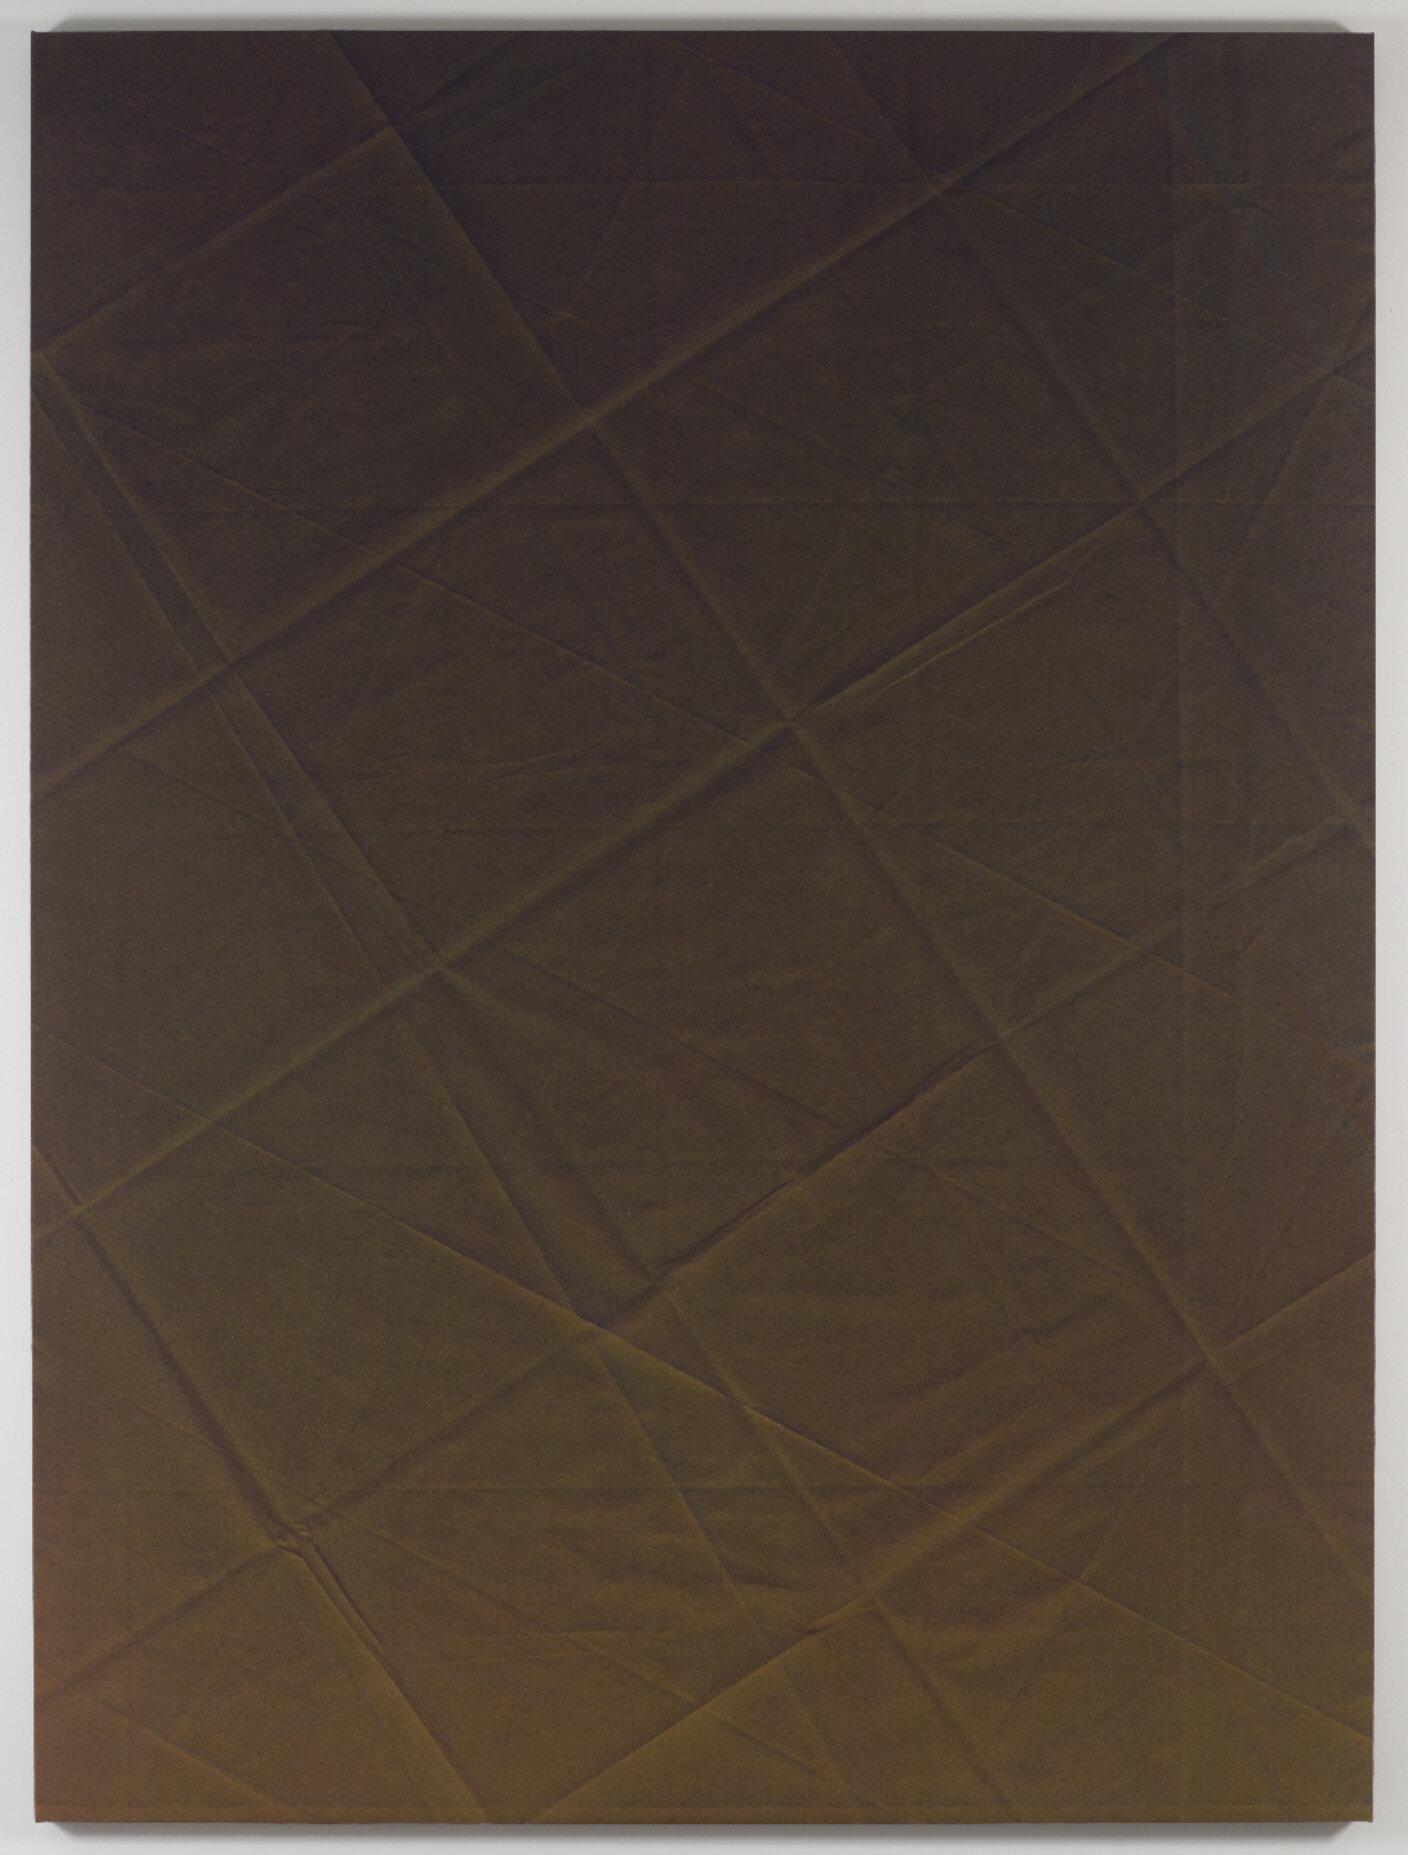 Tauba Auerbach, Untitled (Fold), 2010